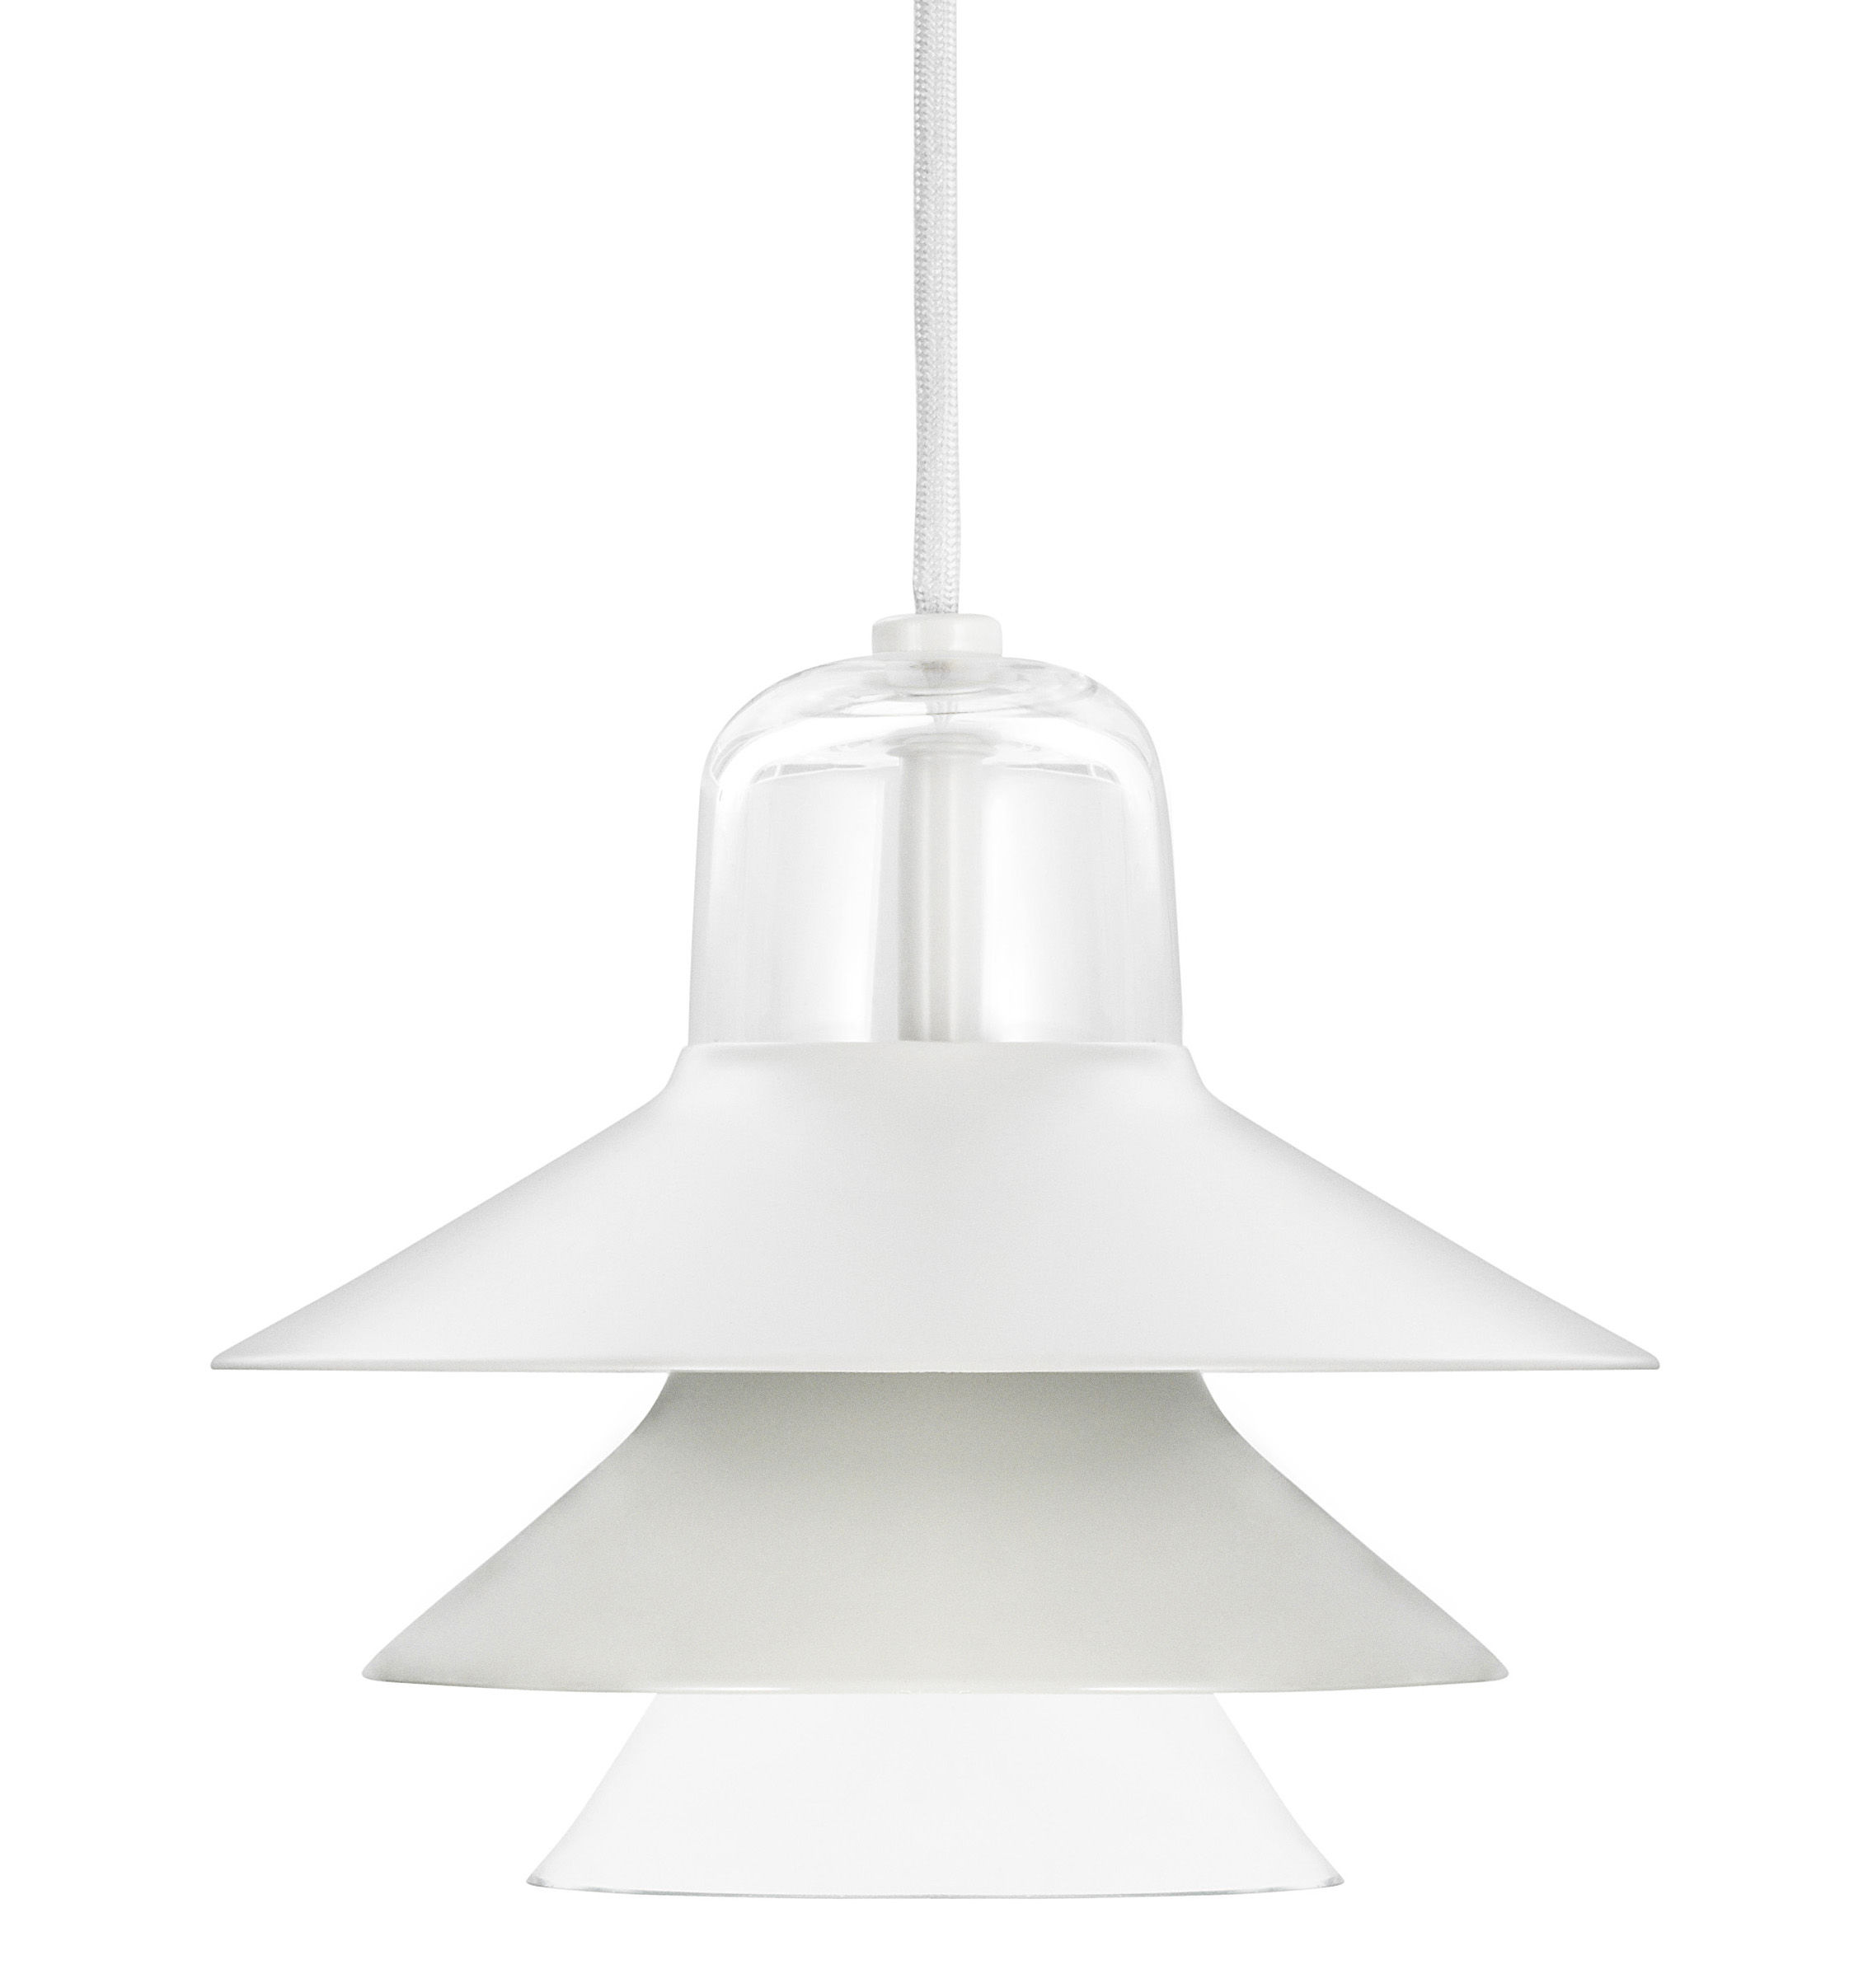 Luminaire - Suspensions - Suspension Ikono Small / Ø 20 cm - Normann Copenhagen - Gris - Acier laqué, Verre